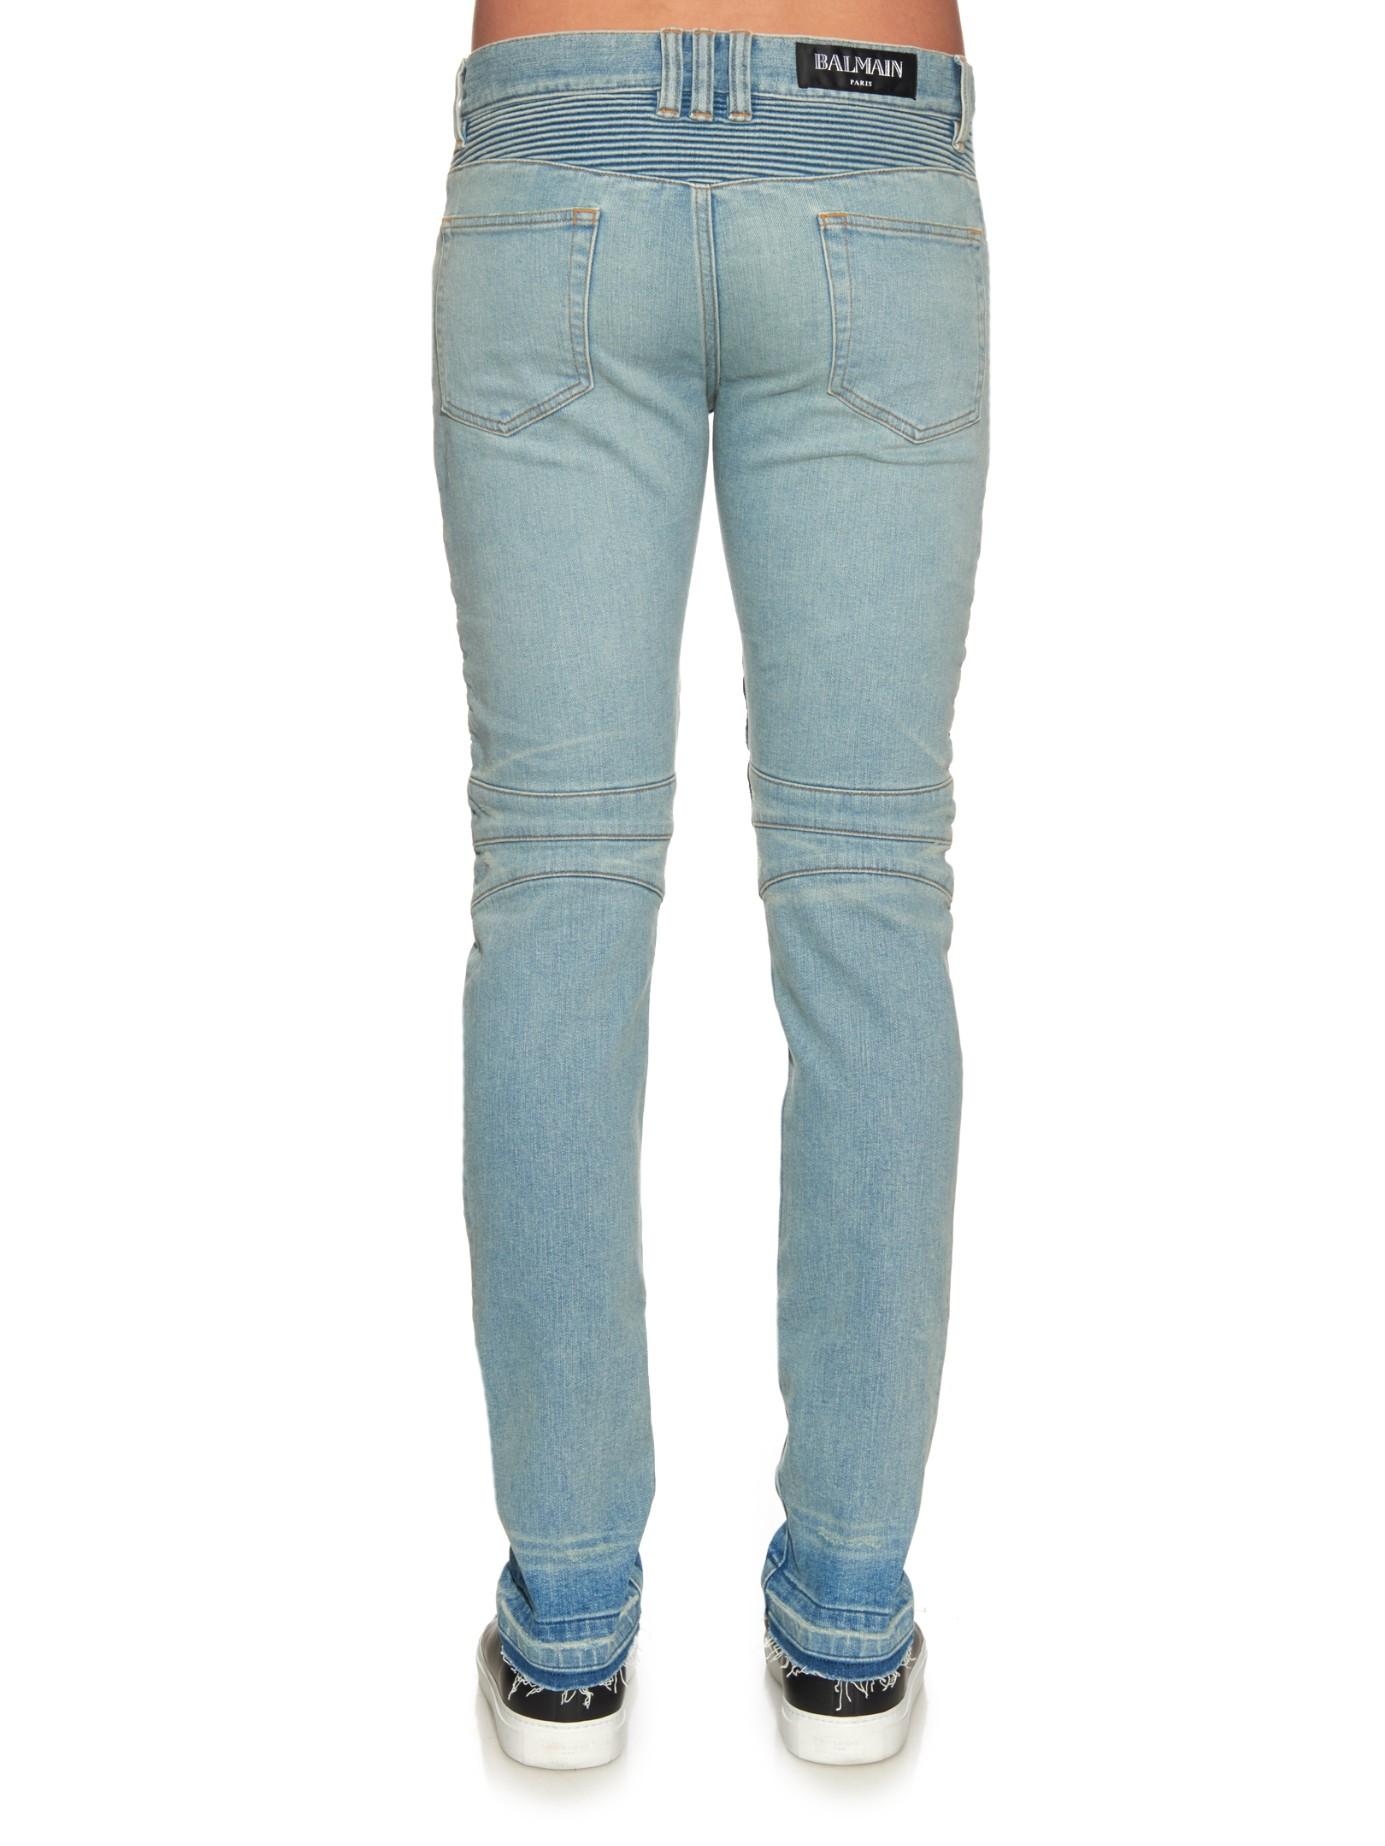 Balmain Denim Slim-fit Tie Dye Moto Jeans in Blue for Men